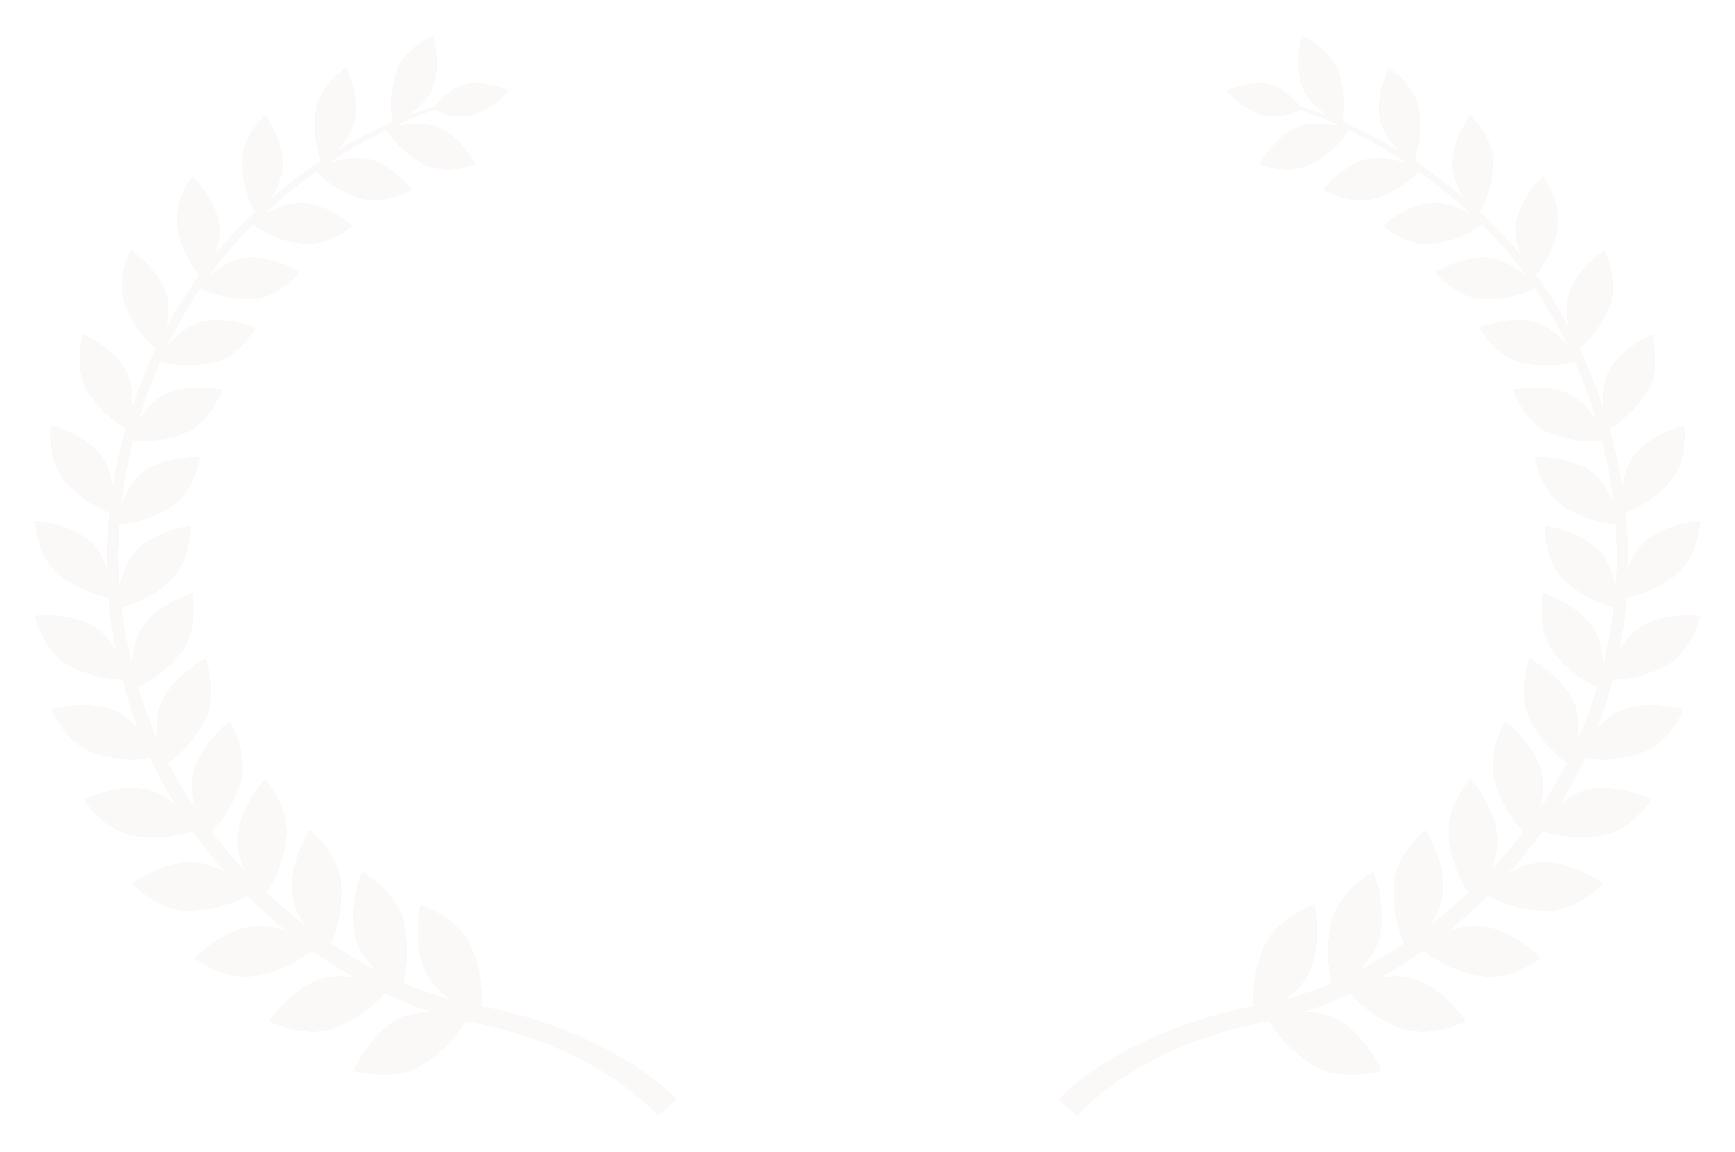 OFFICIAL SELECTION - IX Encuentro Para C